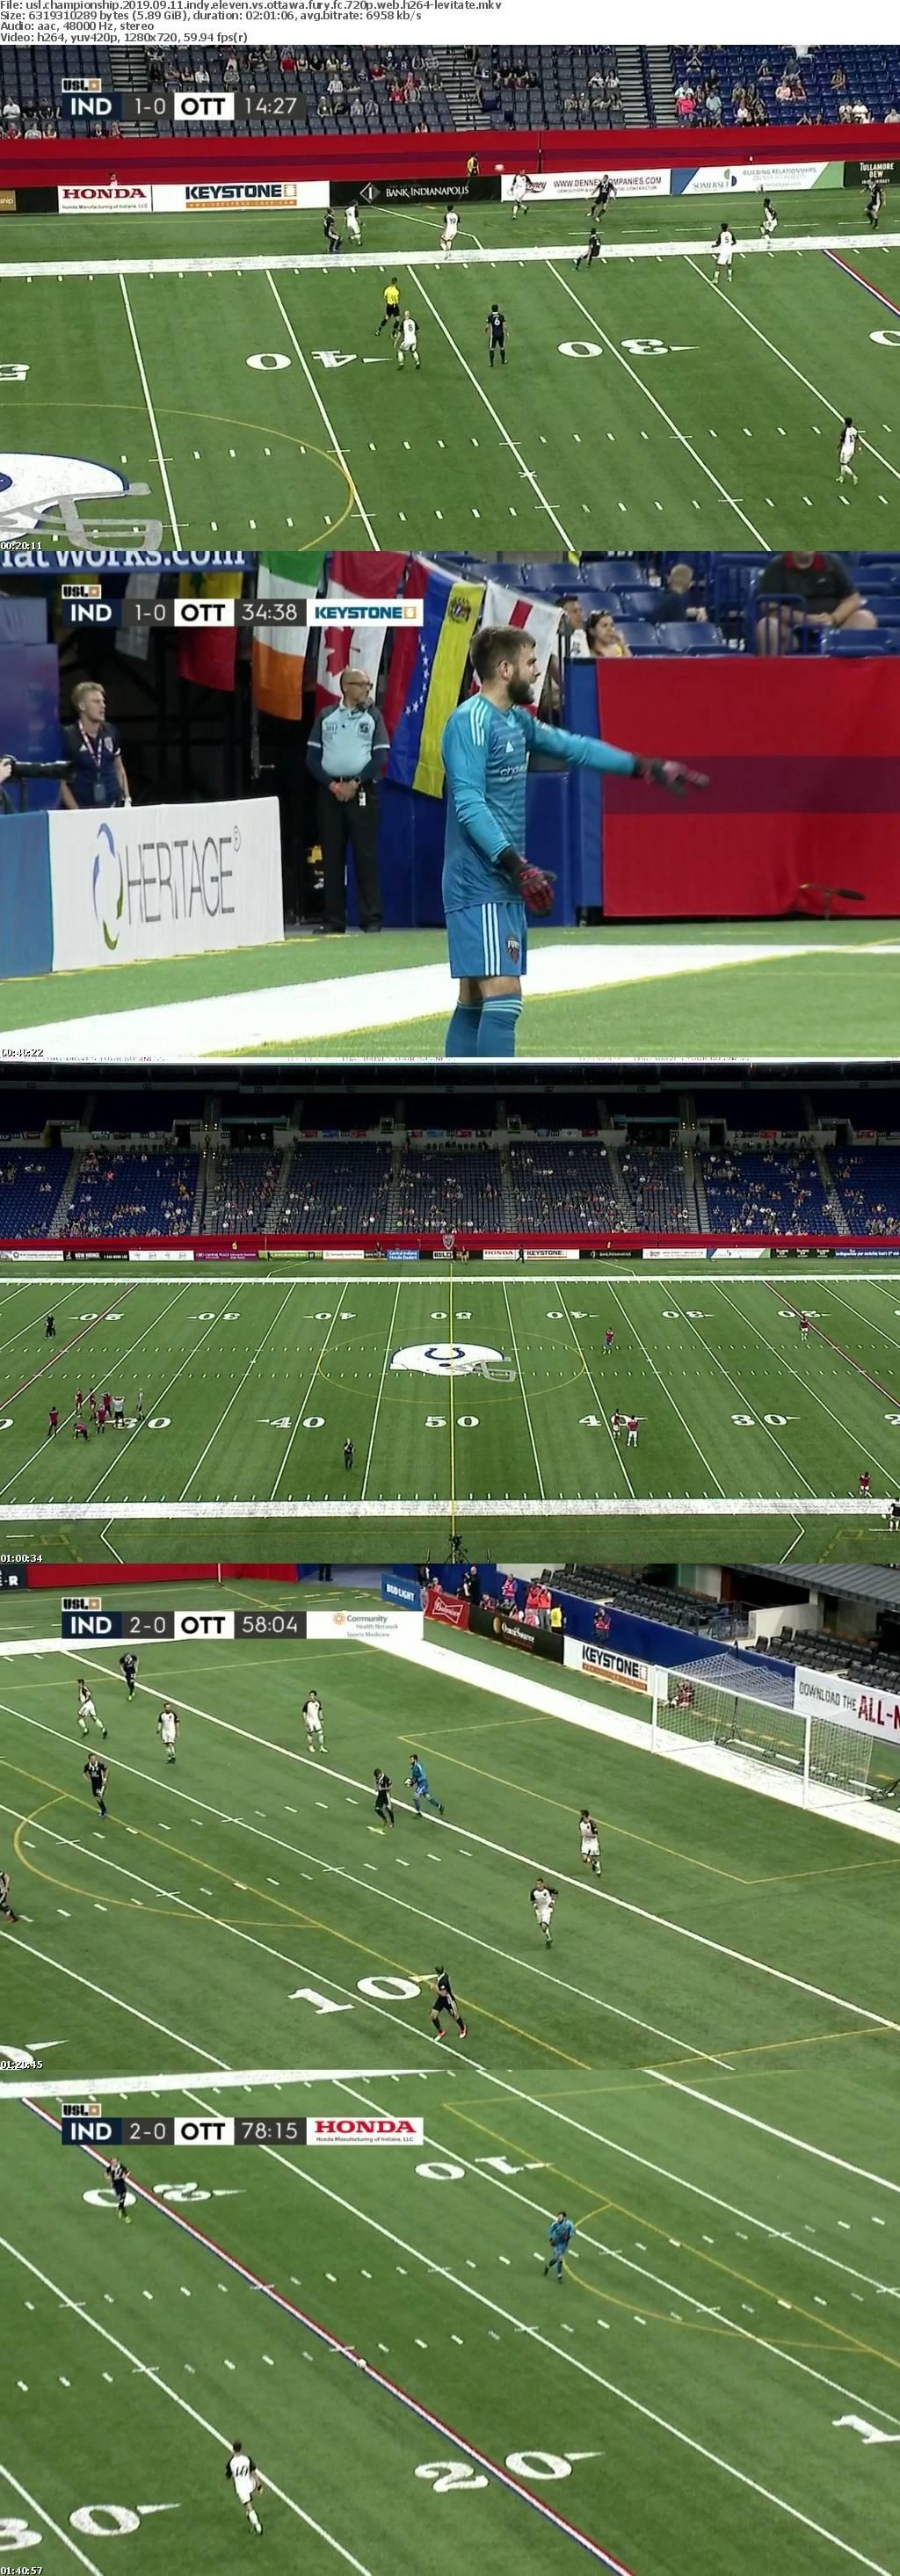 USL Championship 2019 09 11 Indy Eleven vs Ottawa Fury FC 720p WEB H264-LEViTATE